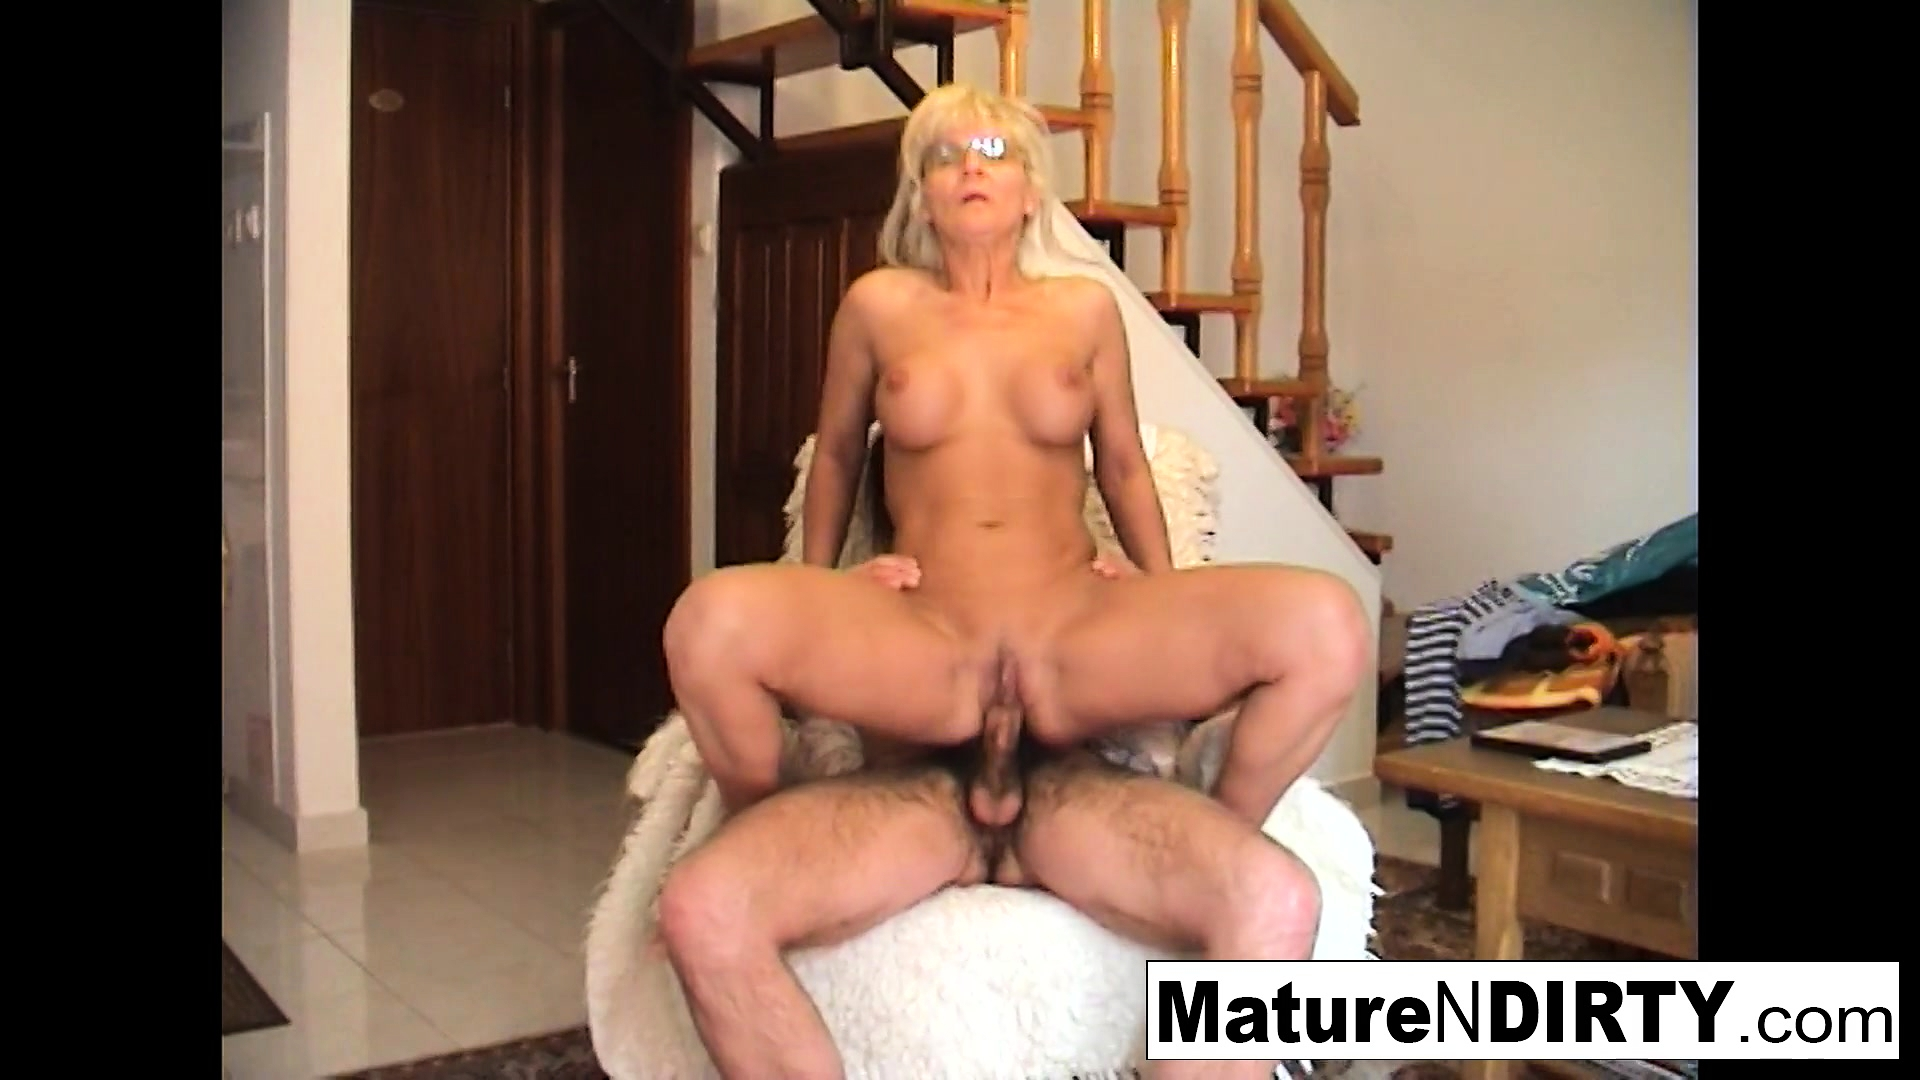 Analfucking Videos free mobile porn - mature blonde slut receives an anal